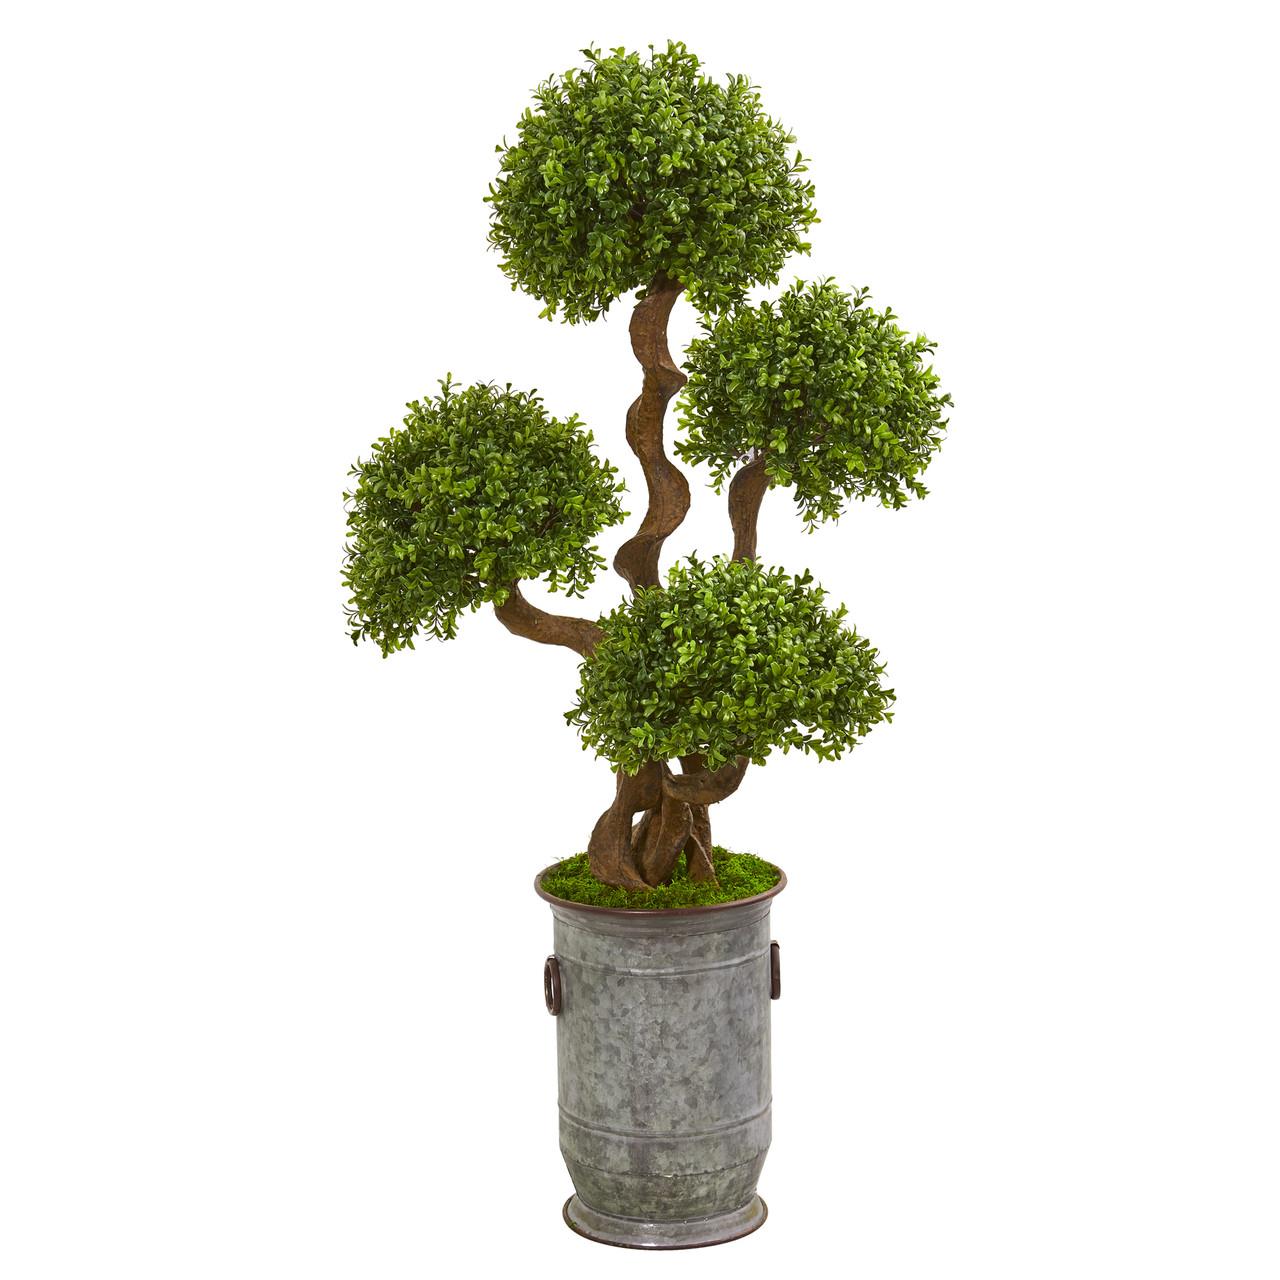 50 Triple Ball Boxwood Artificial Topiary Tree In Metal Planter Modern Farmhouse Glam